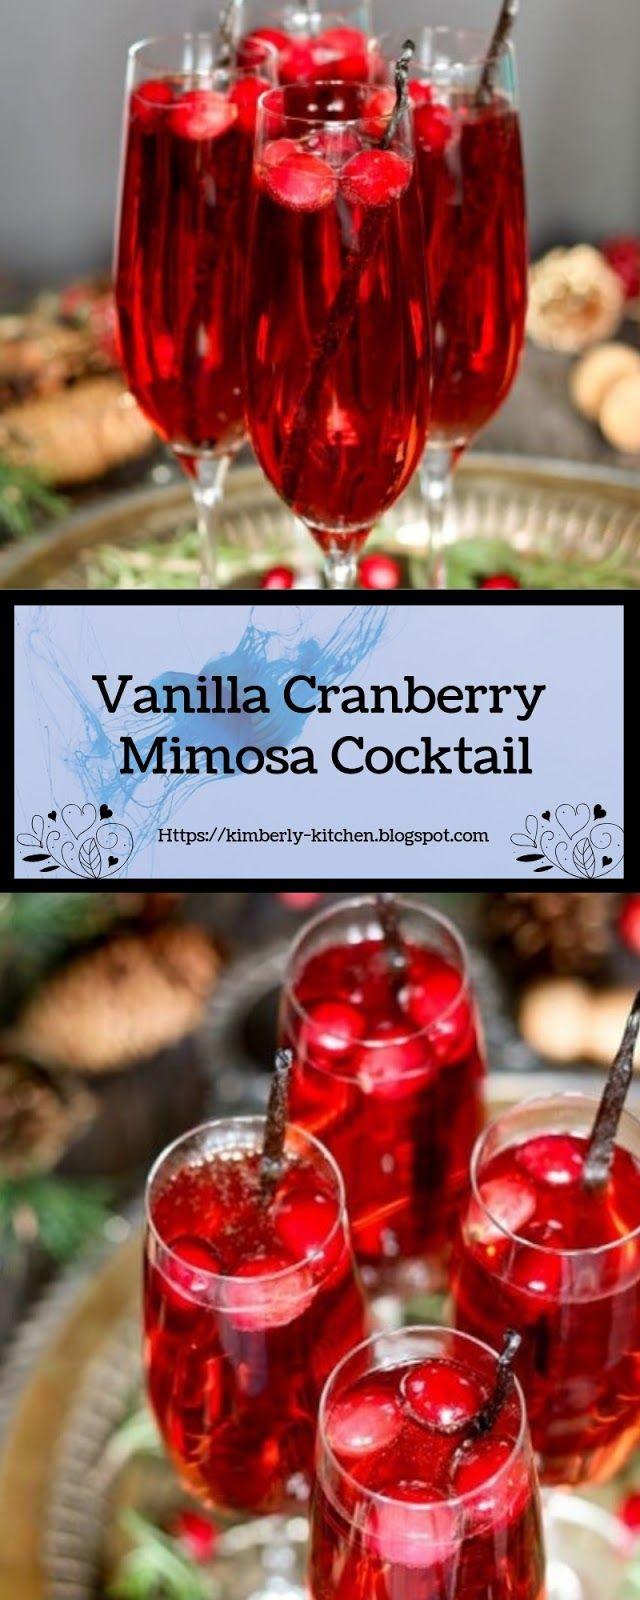 Vanilla Cranberry Mimosa Cocktail Kimberly Kitchen Mimosa Cocktail Fun Drinks Drinks